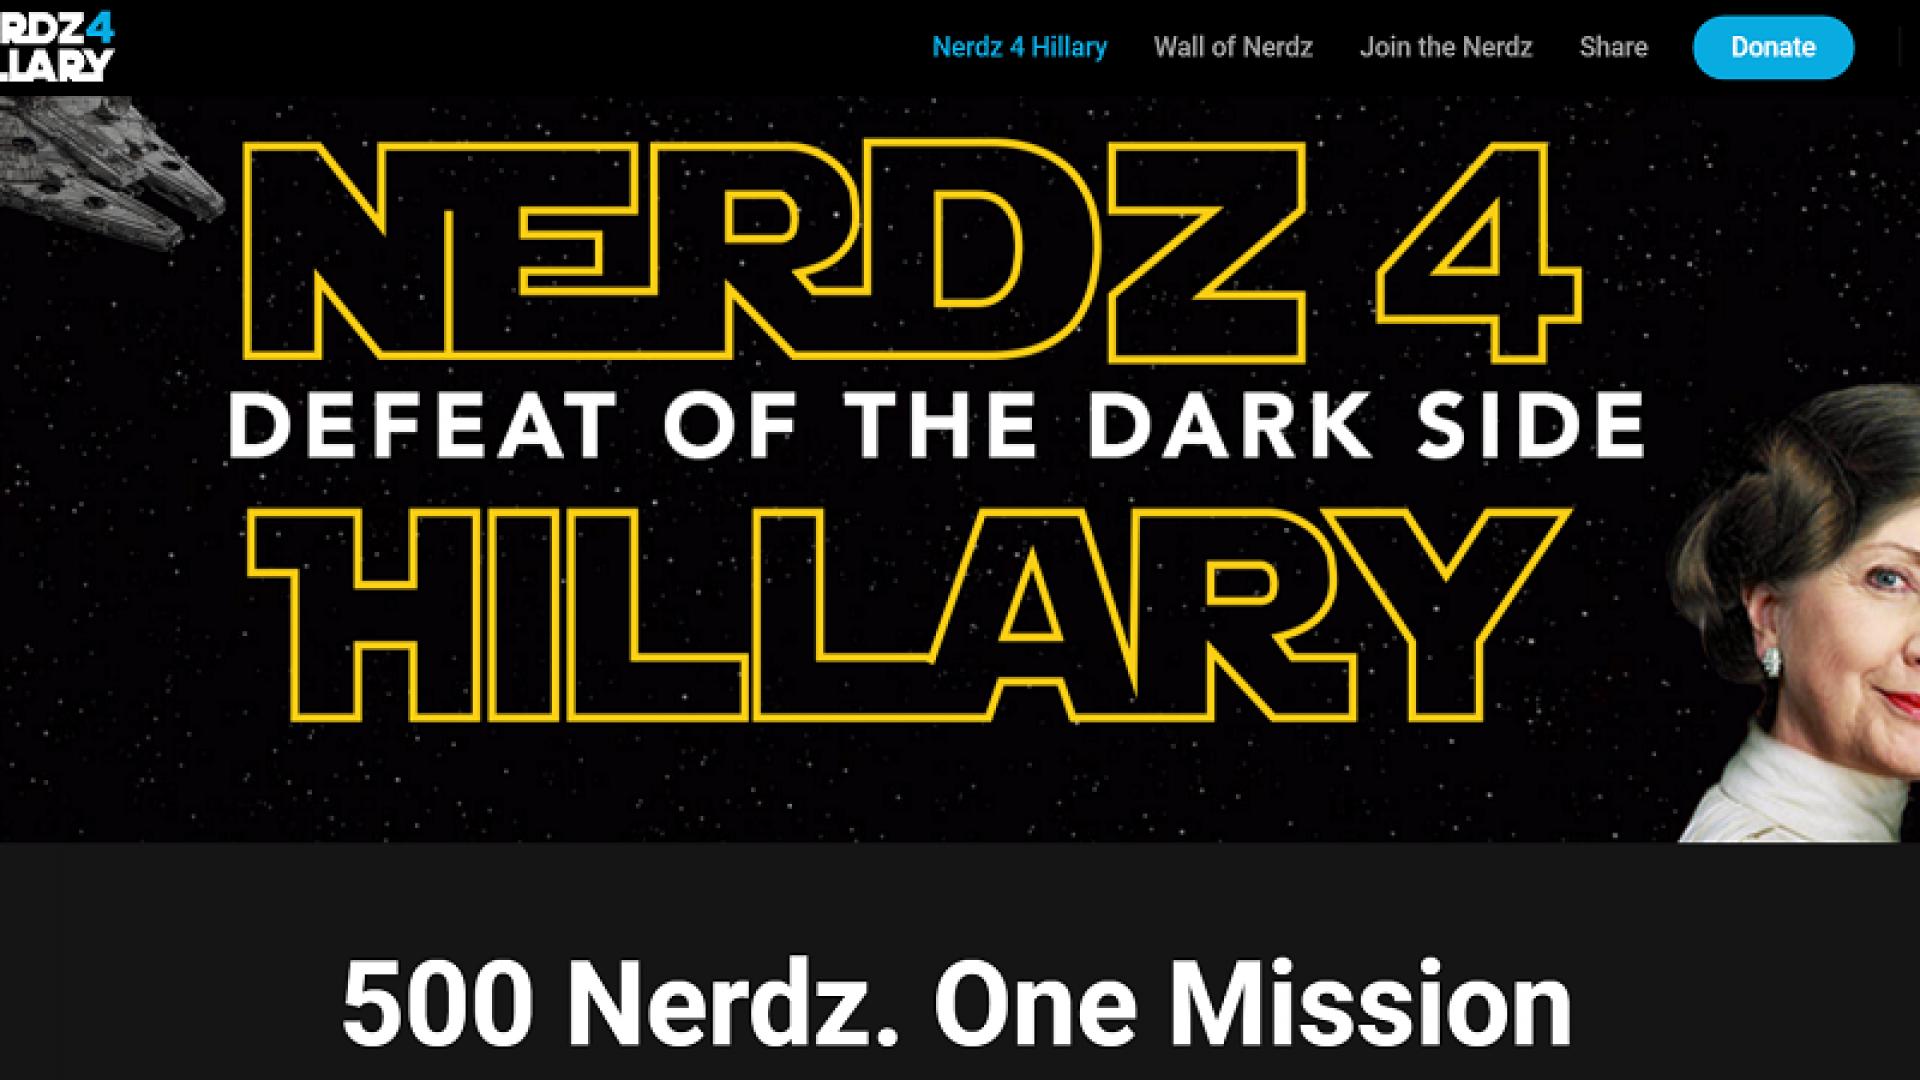 Why Startup Guru Dave McClure Is Rallying Fellow 'Nerdz' to Defeat Donald Trump